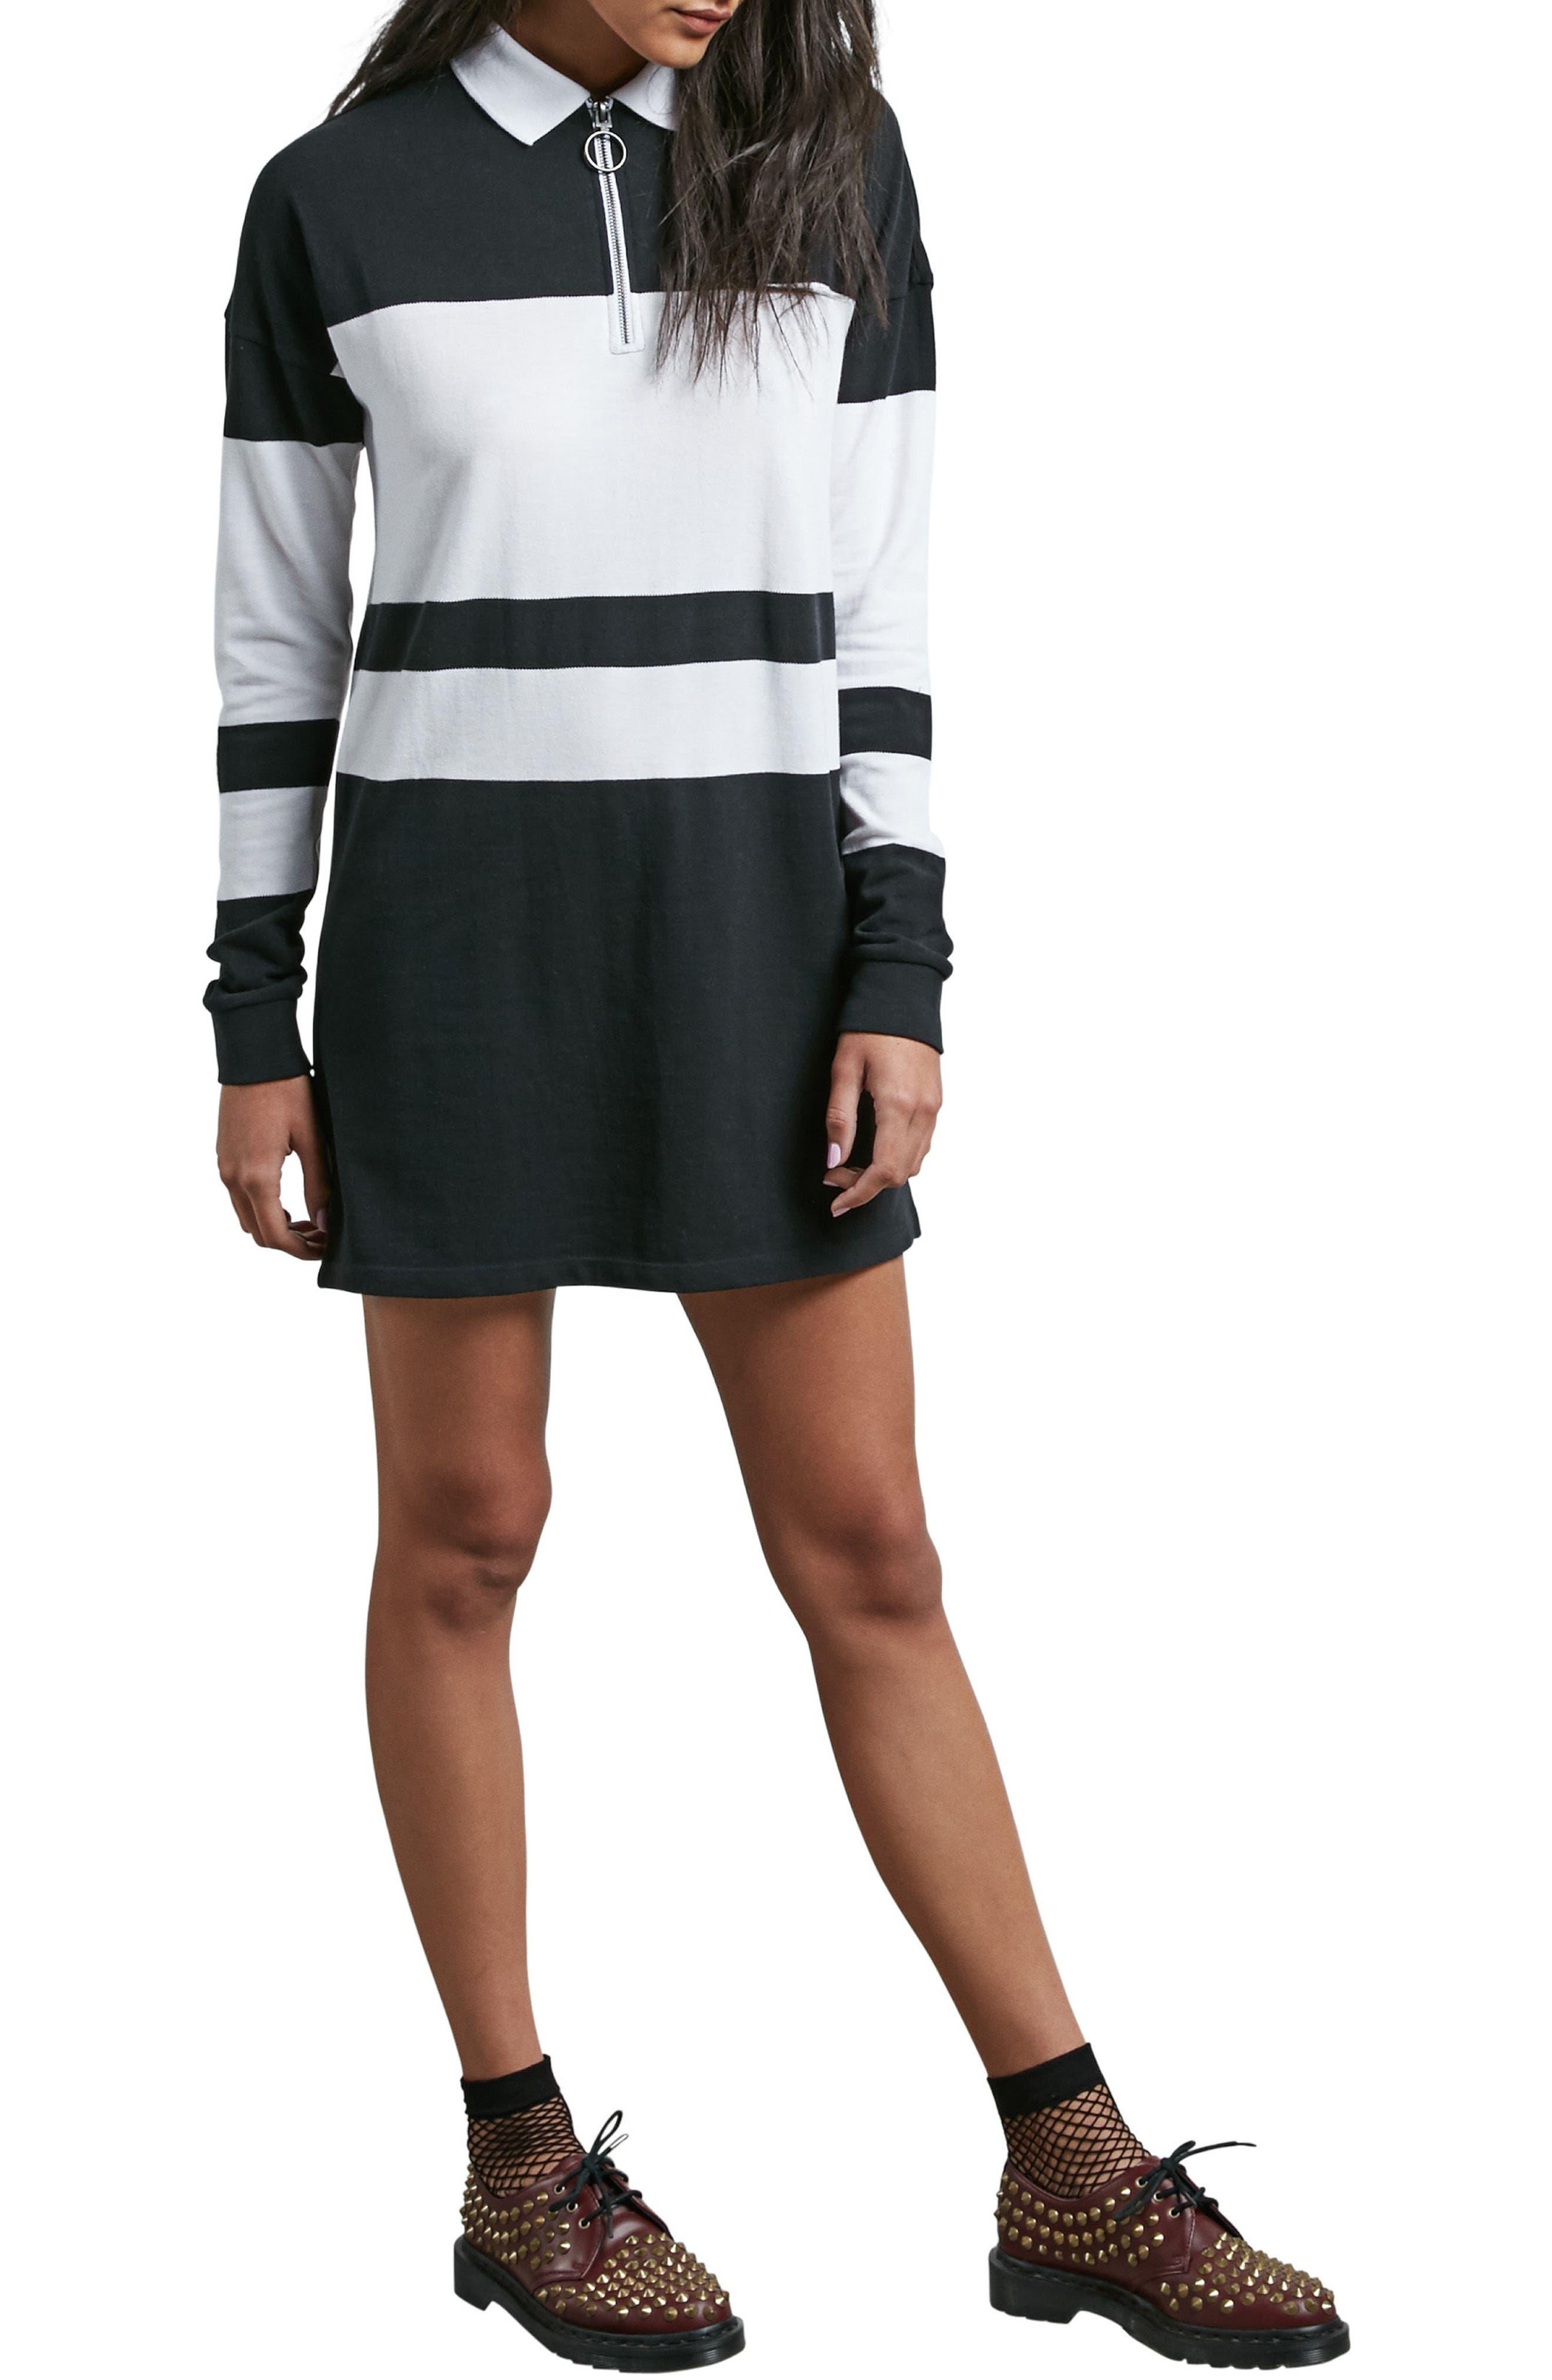 Main Image - Volcom Pique Boo Rugby Dress